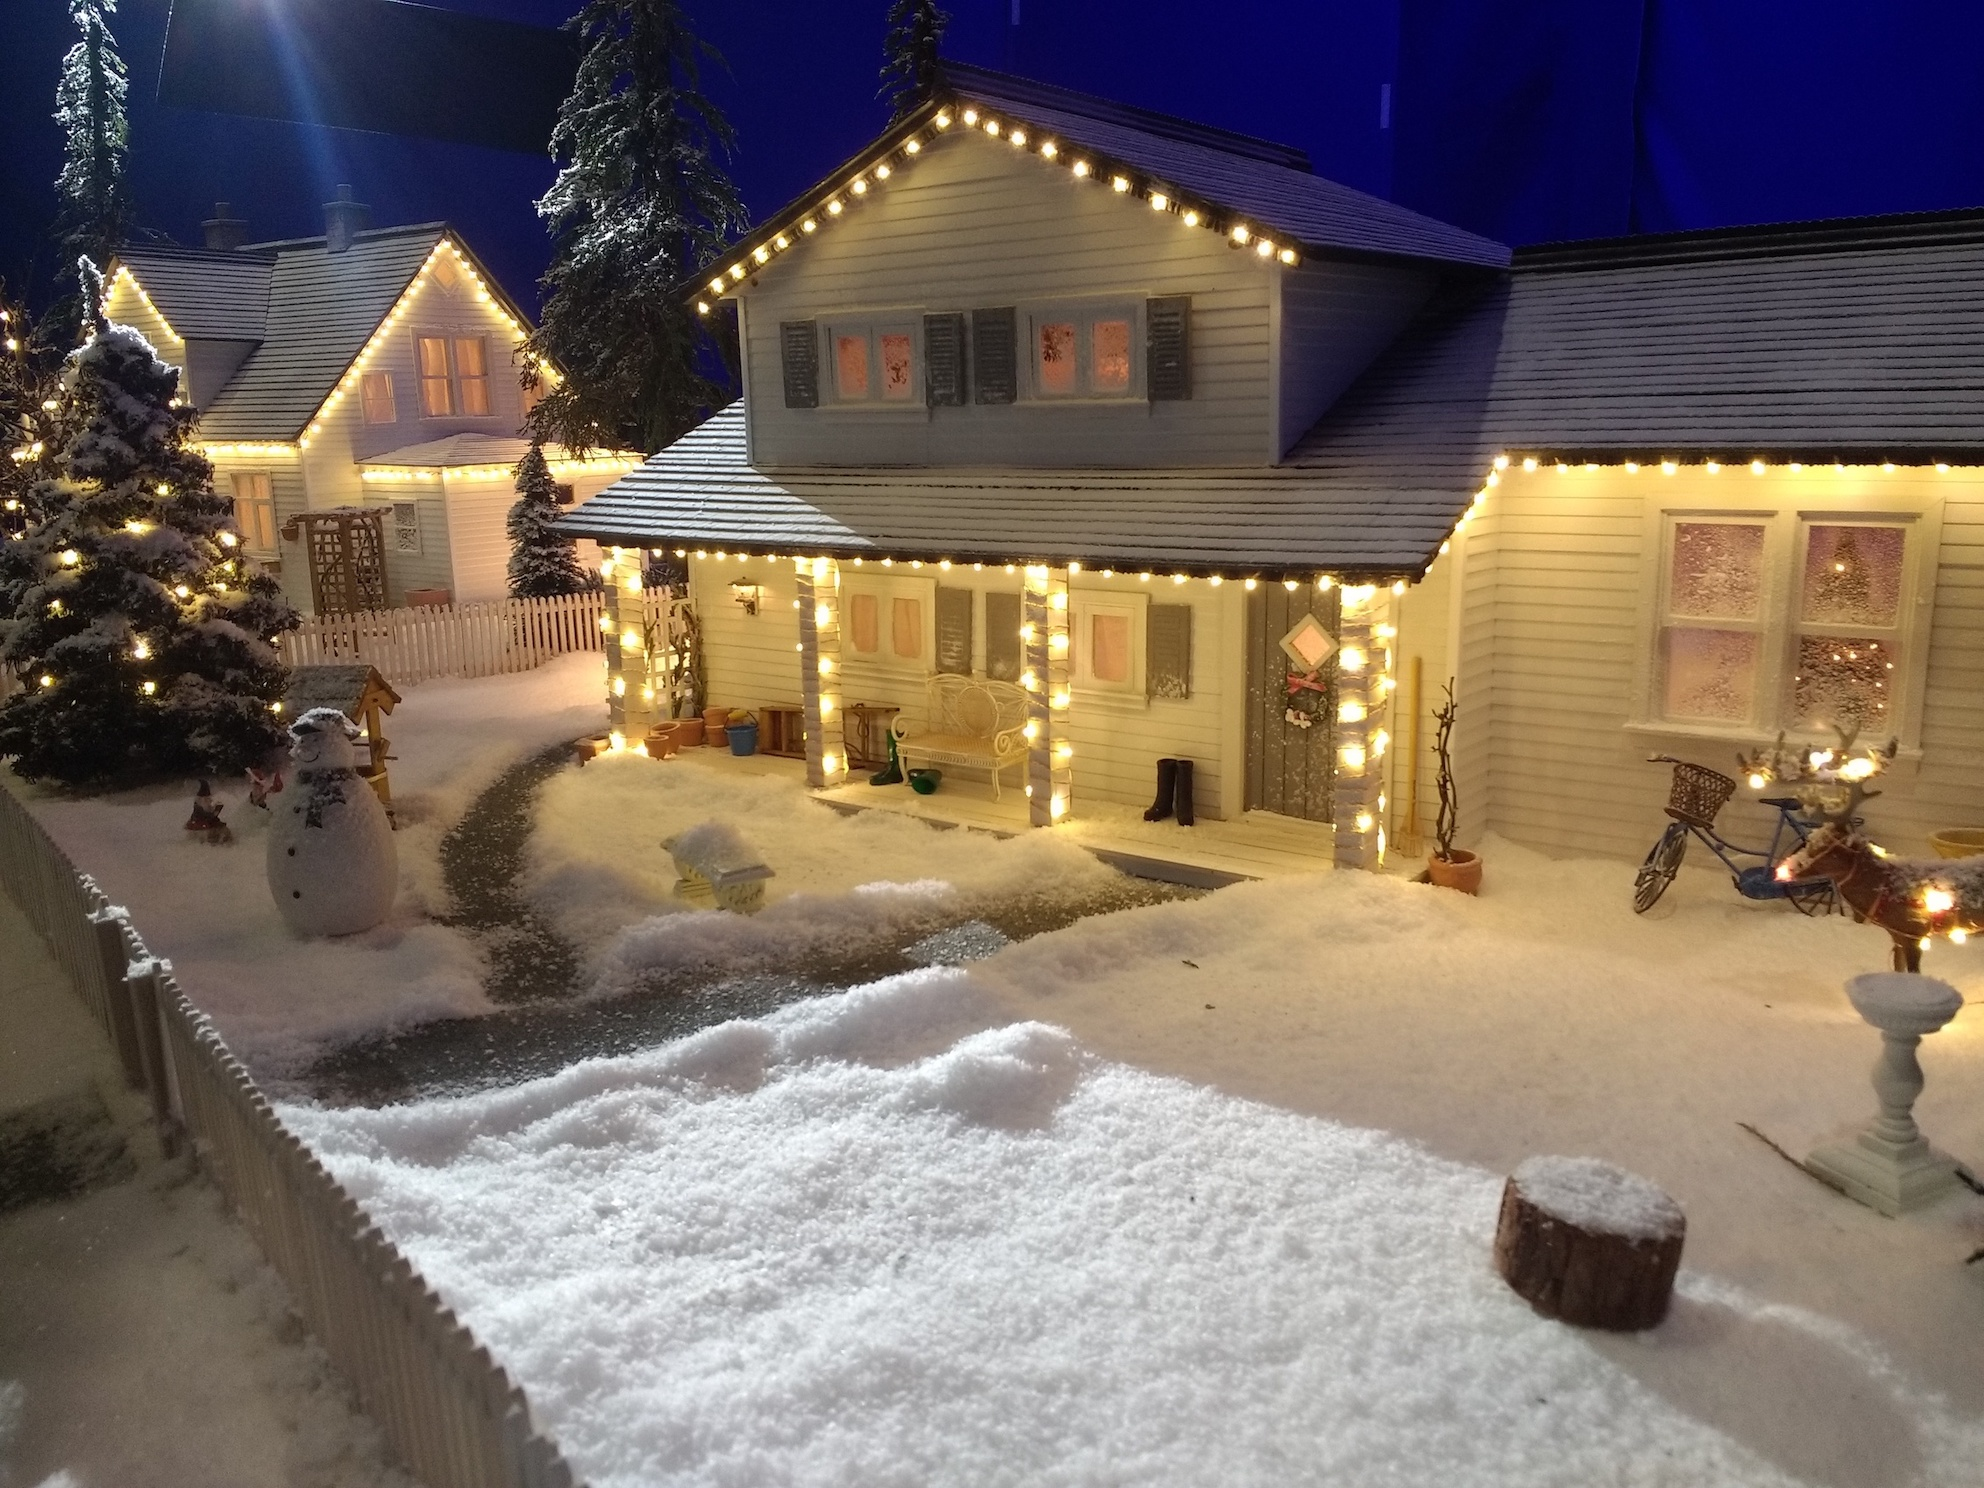 Miniature model set for CGI animation